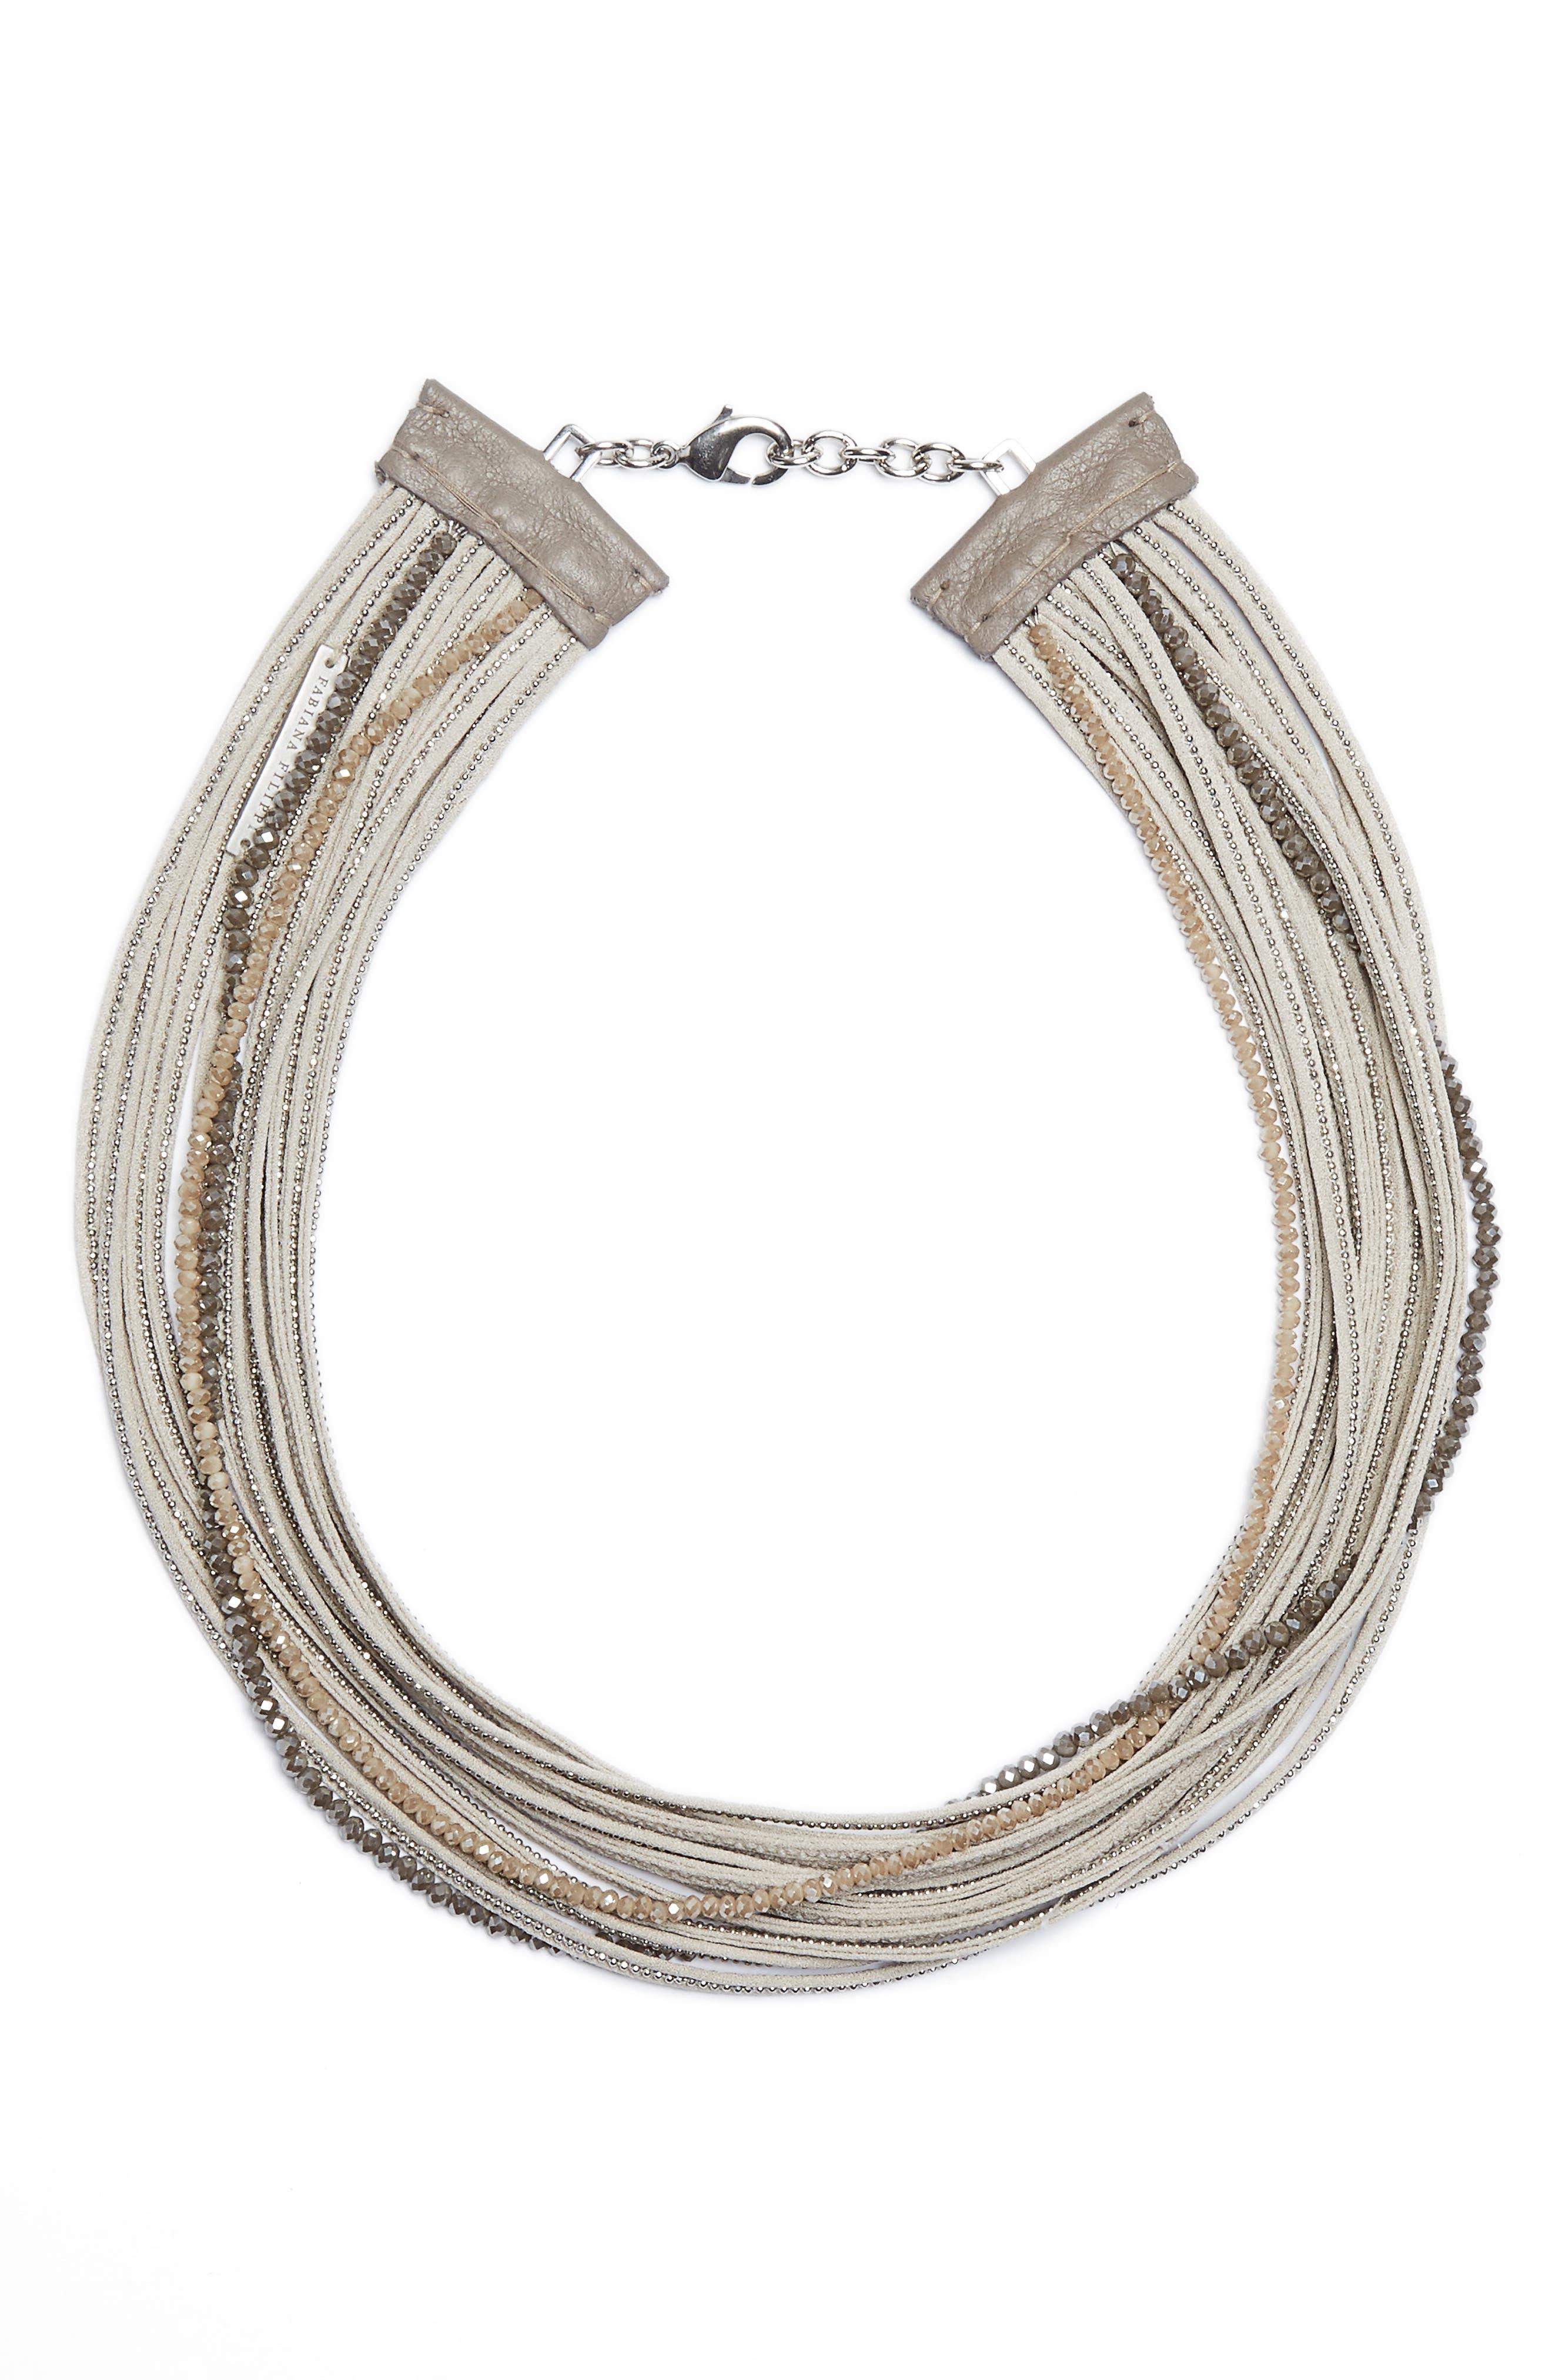 Fabiana Filippi Multistrand Beaded Stretch Silk Necklace